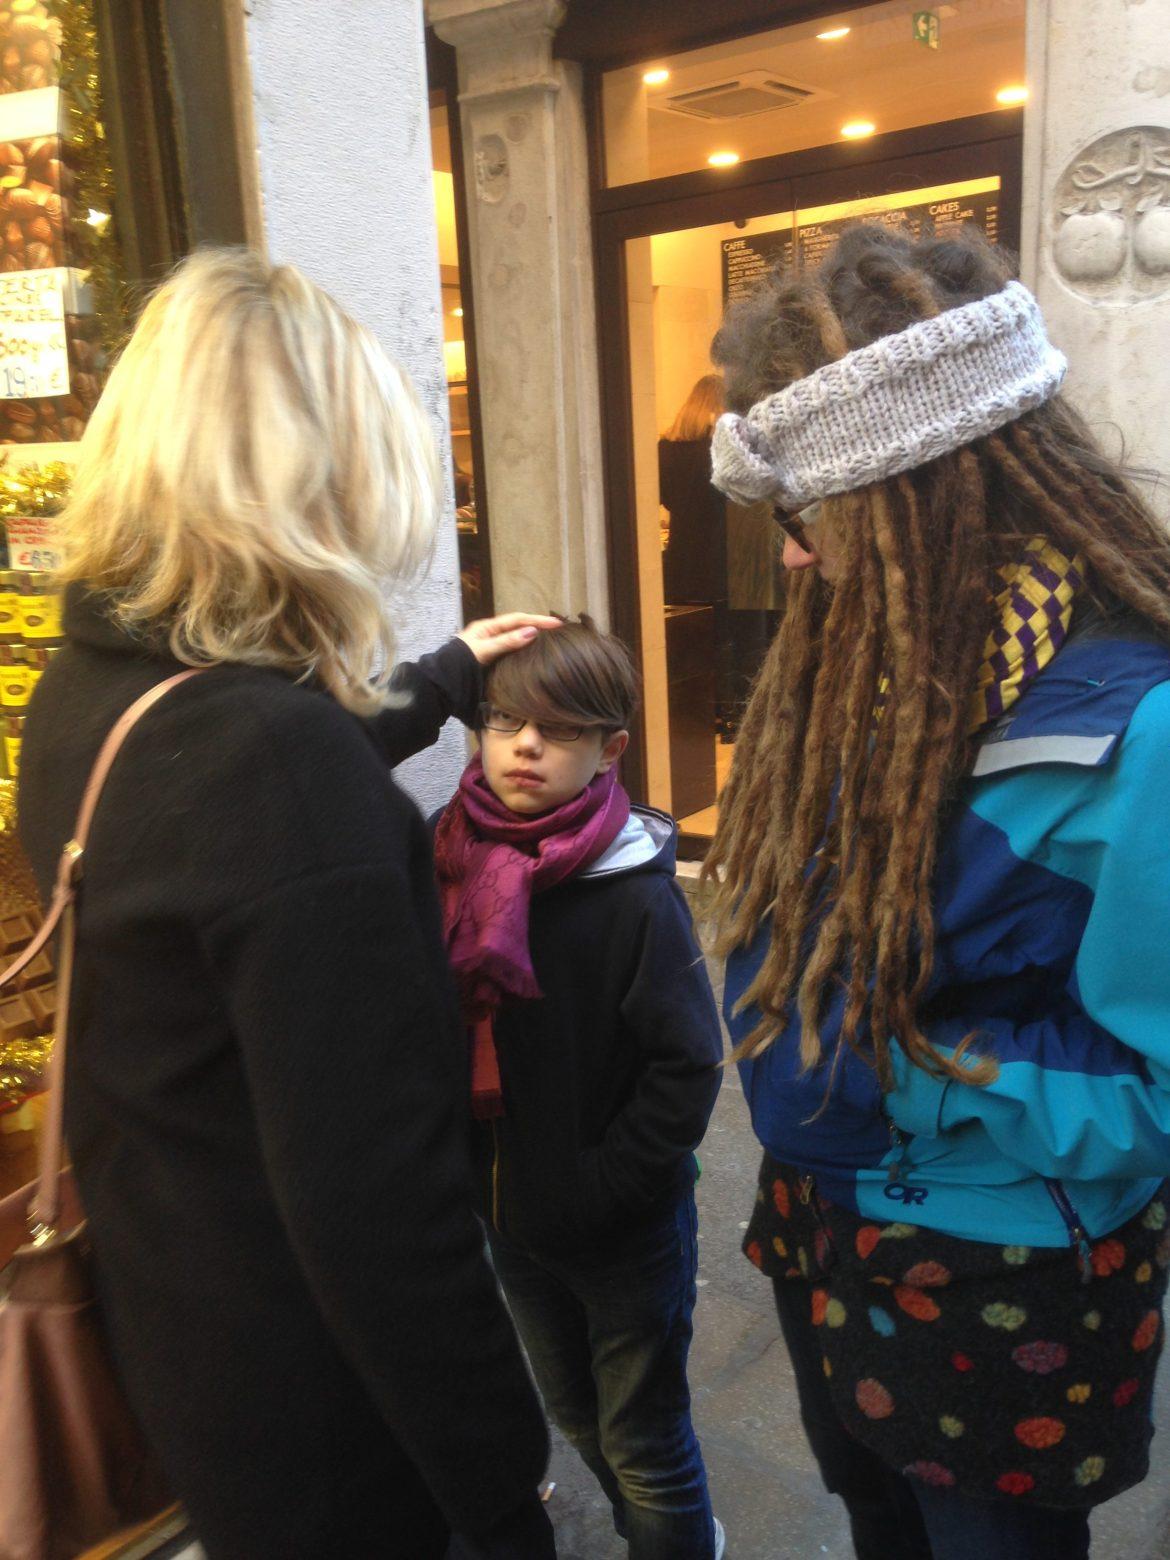 Venice Walks of Italy Tour